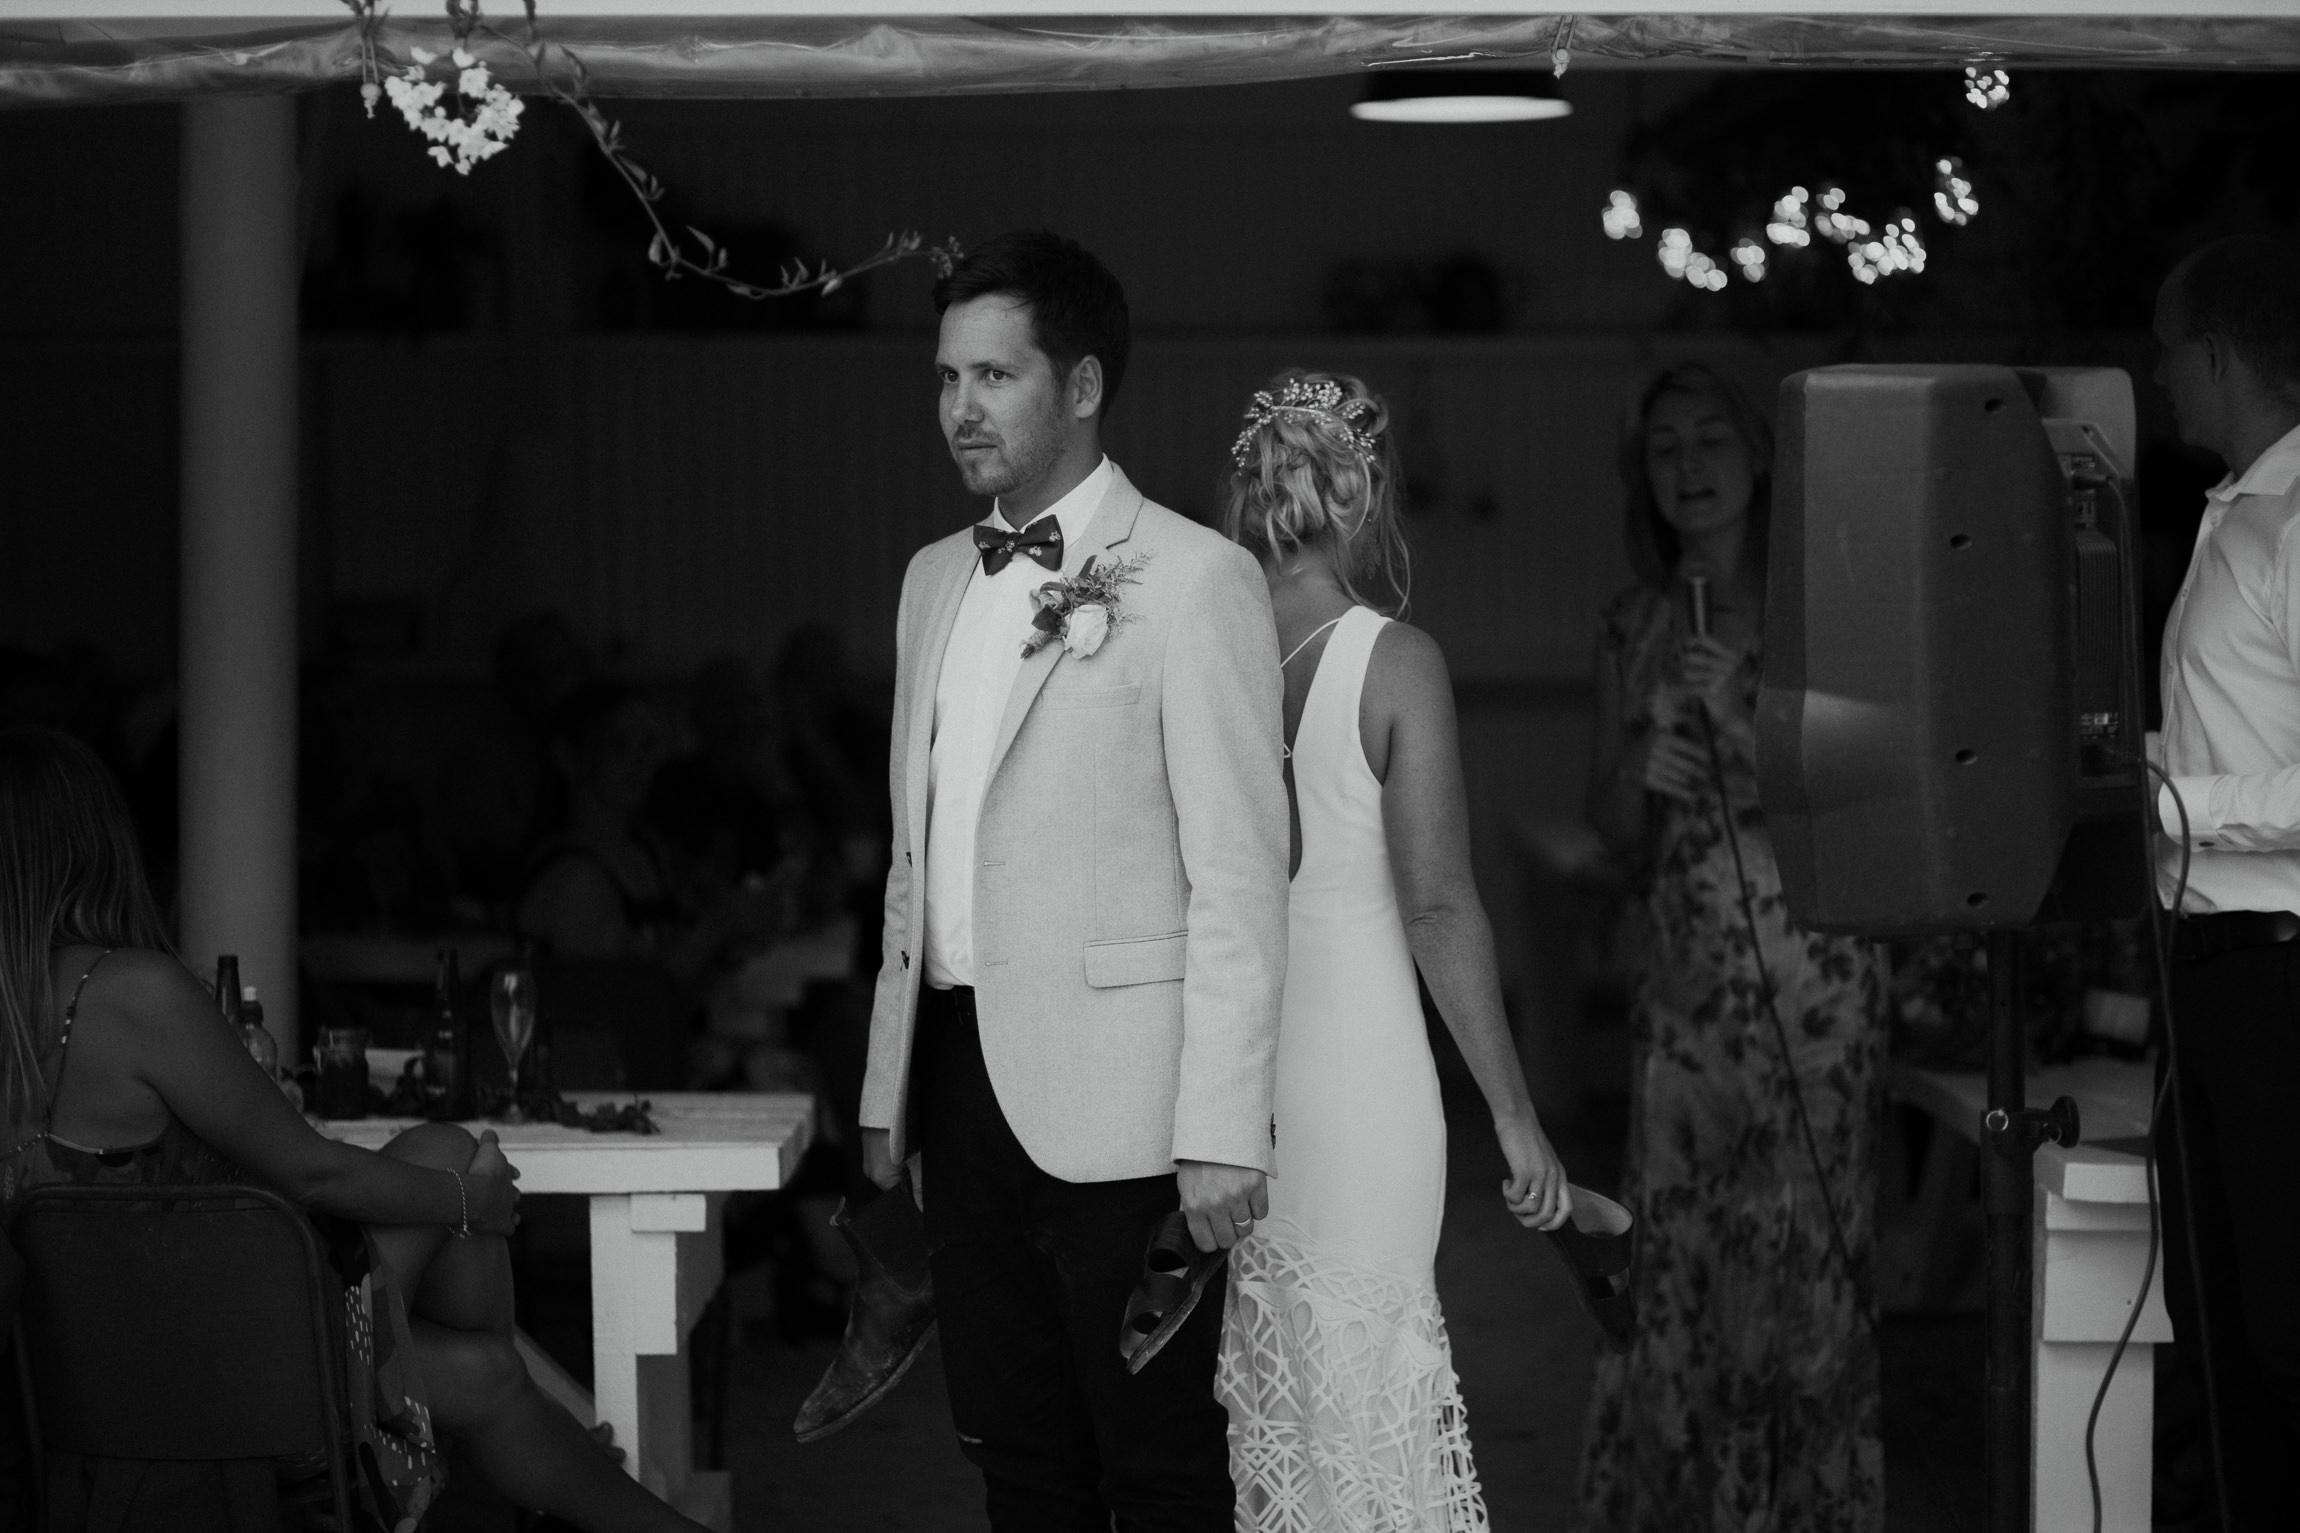 oldforestschool-wedding-blog-179.jpg